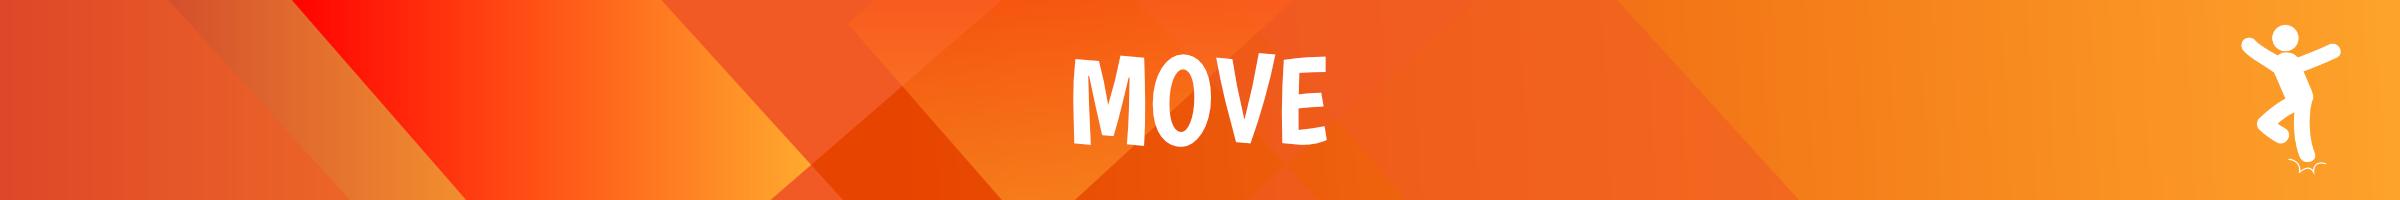 move header.png